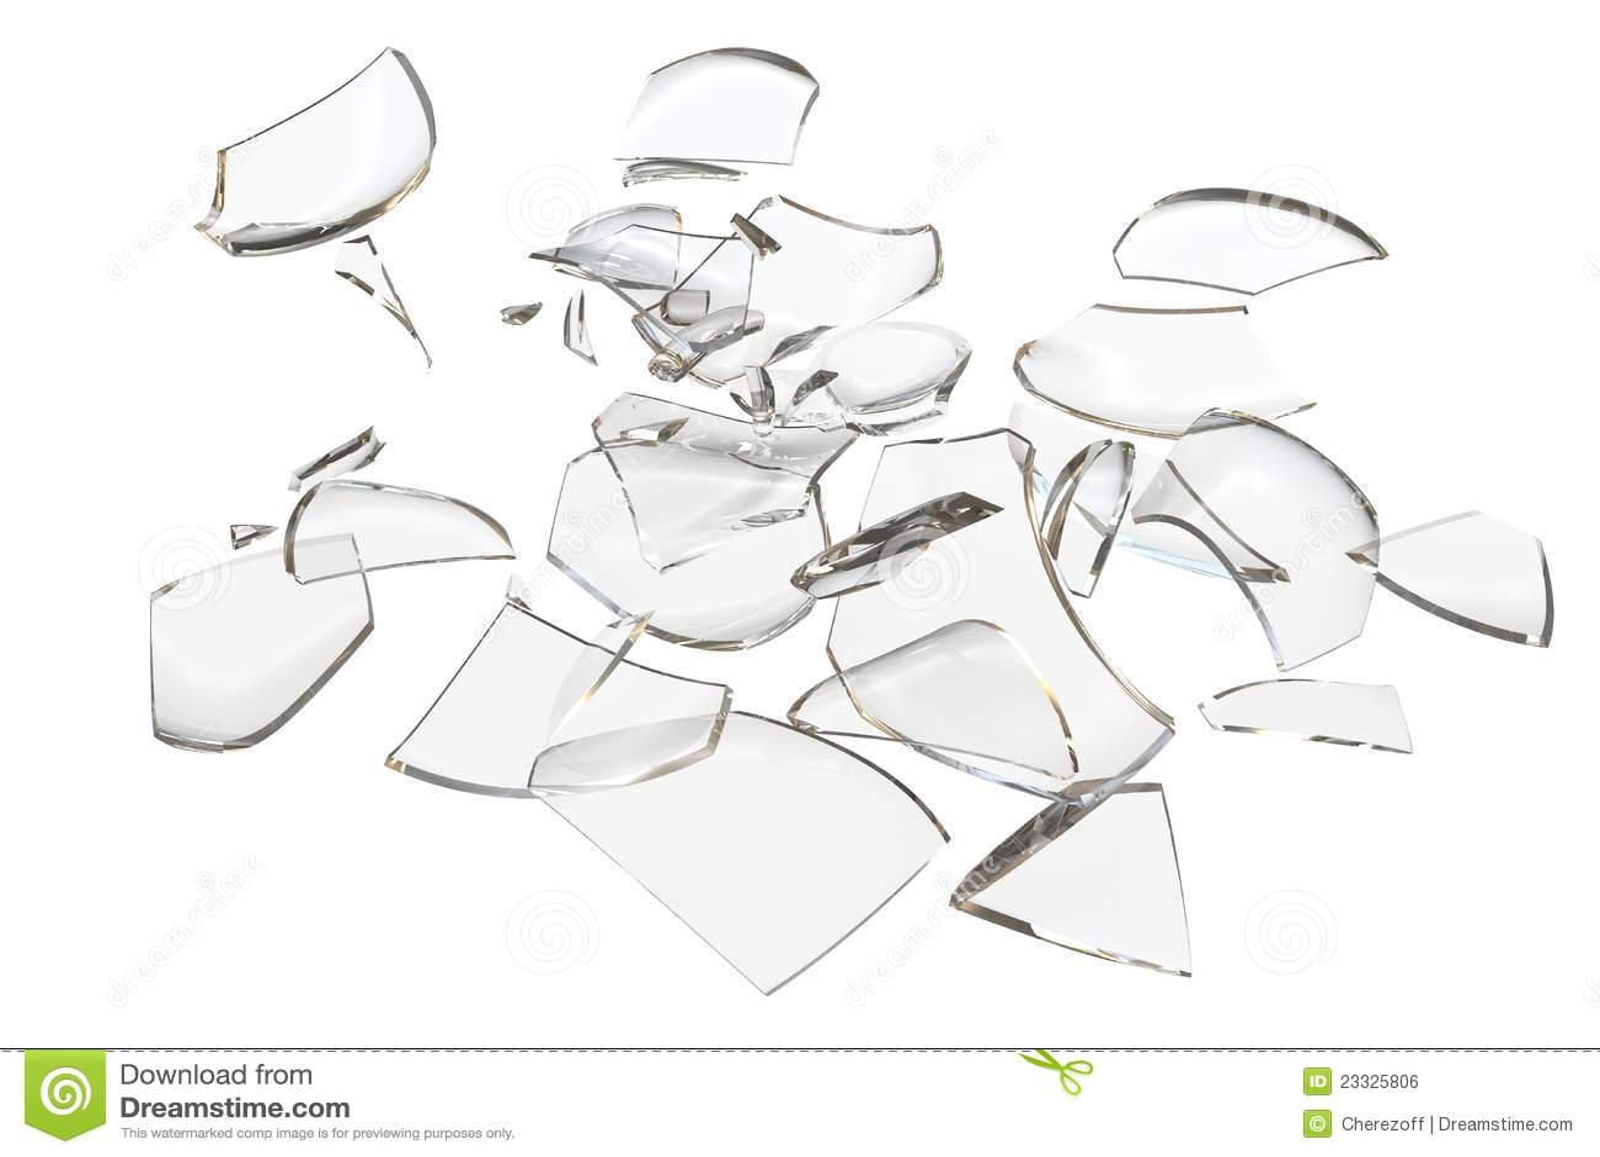 Stock Illustration Ammunition Silhouettes Set Isolated White Vector Eps Image42403460 also Bb 8 The Force Awakens likewise Disegni Da Colorar Alfa Romeo Italia additionally Koloryt Ksi C4 85 C5 BCka Strach Na Wr C3 B3ble 33714305 in addition Krakenrobotik. on robot clipart